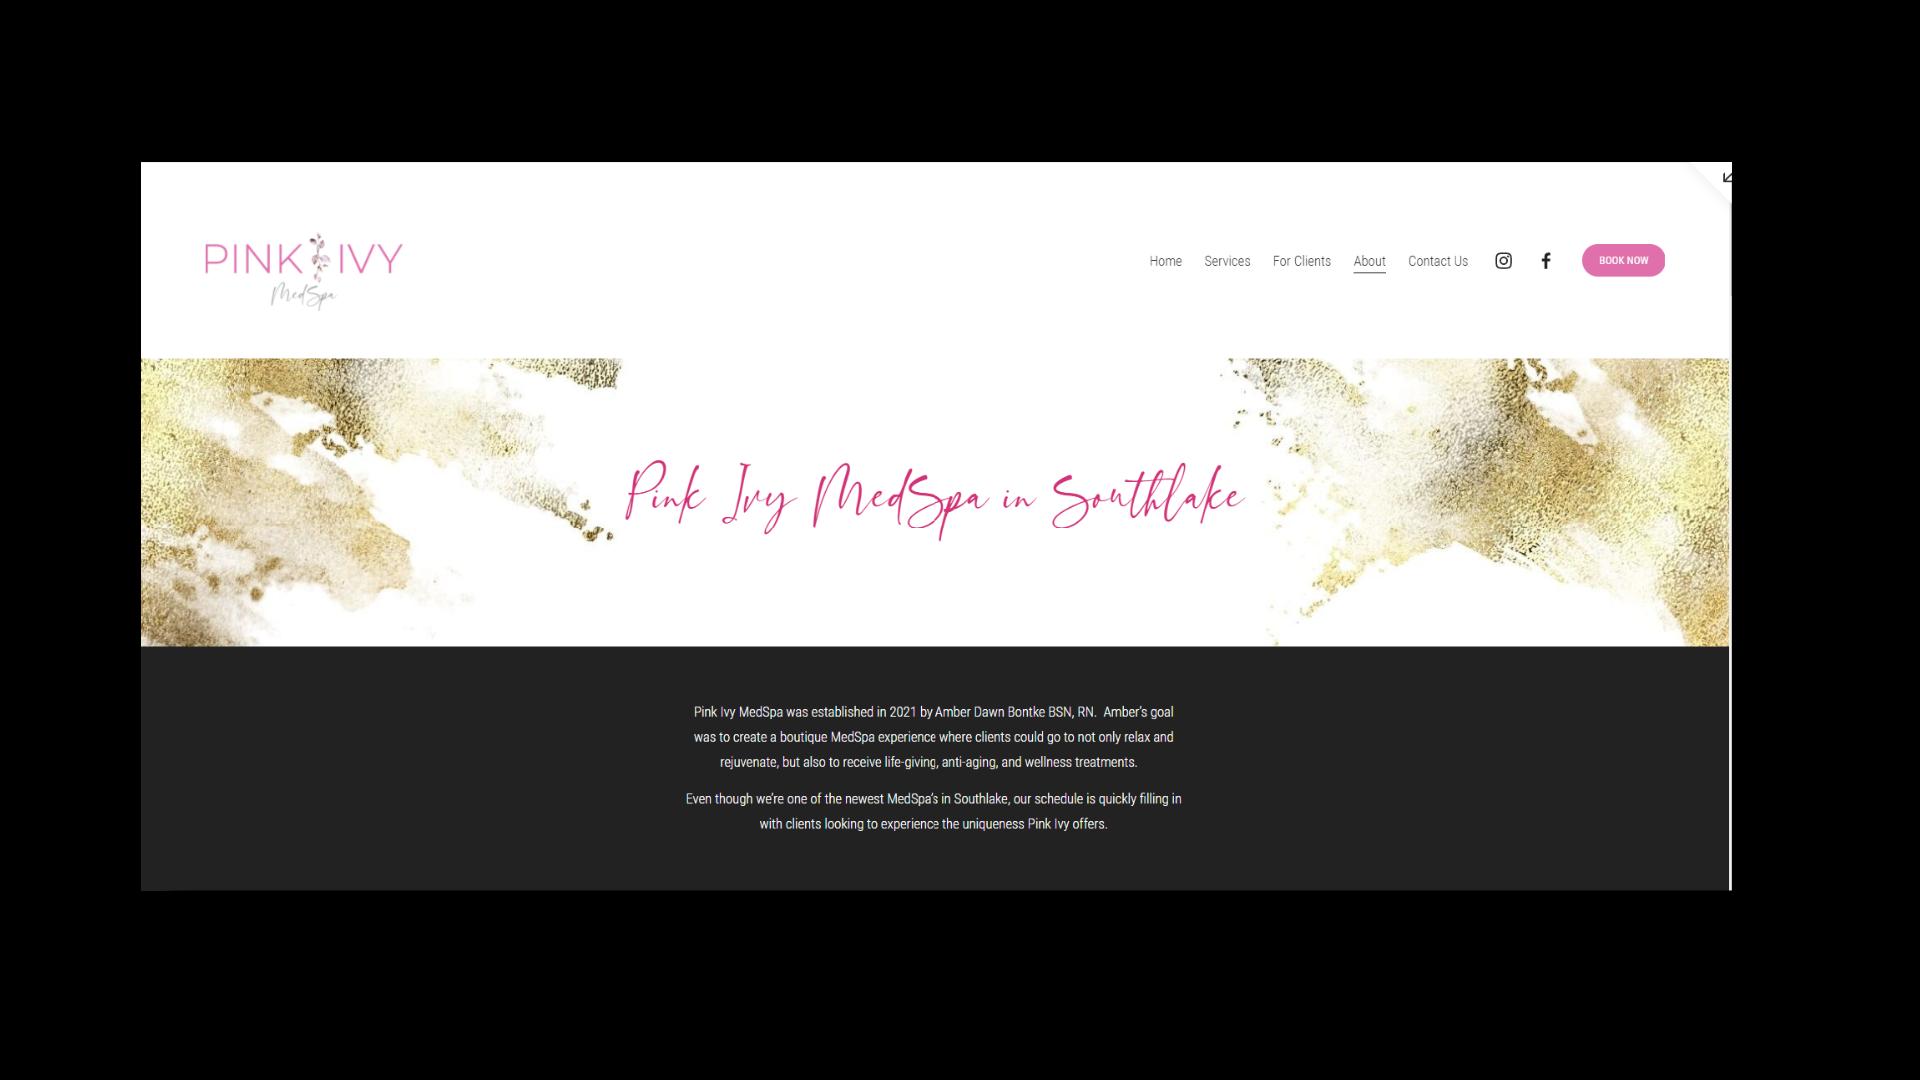 Pink Ivy Website Interior Page Sample